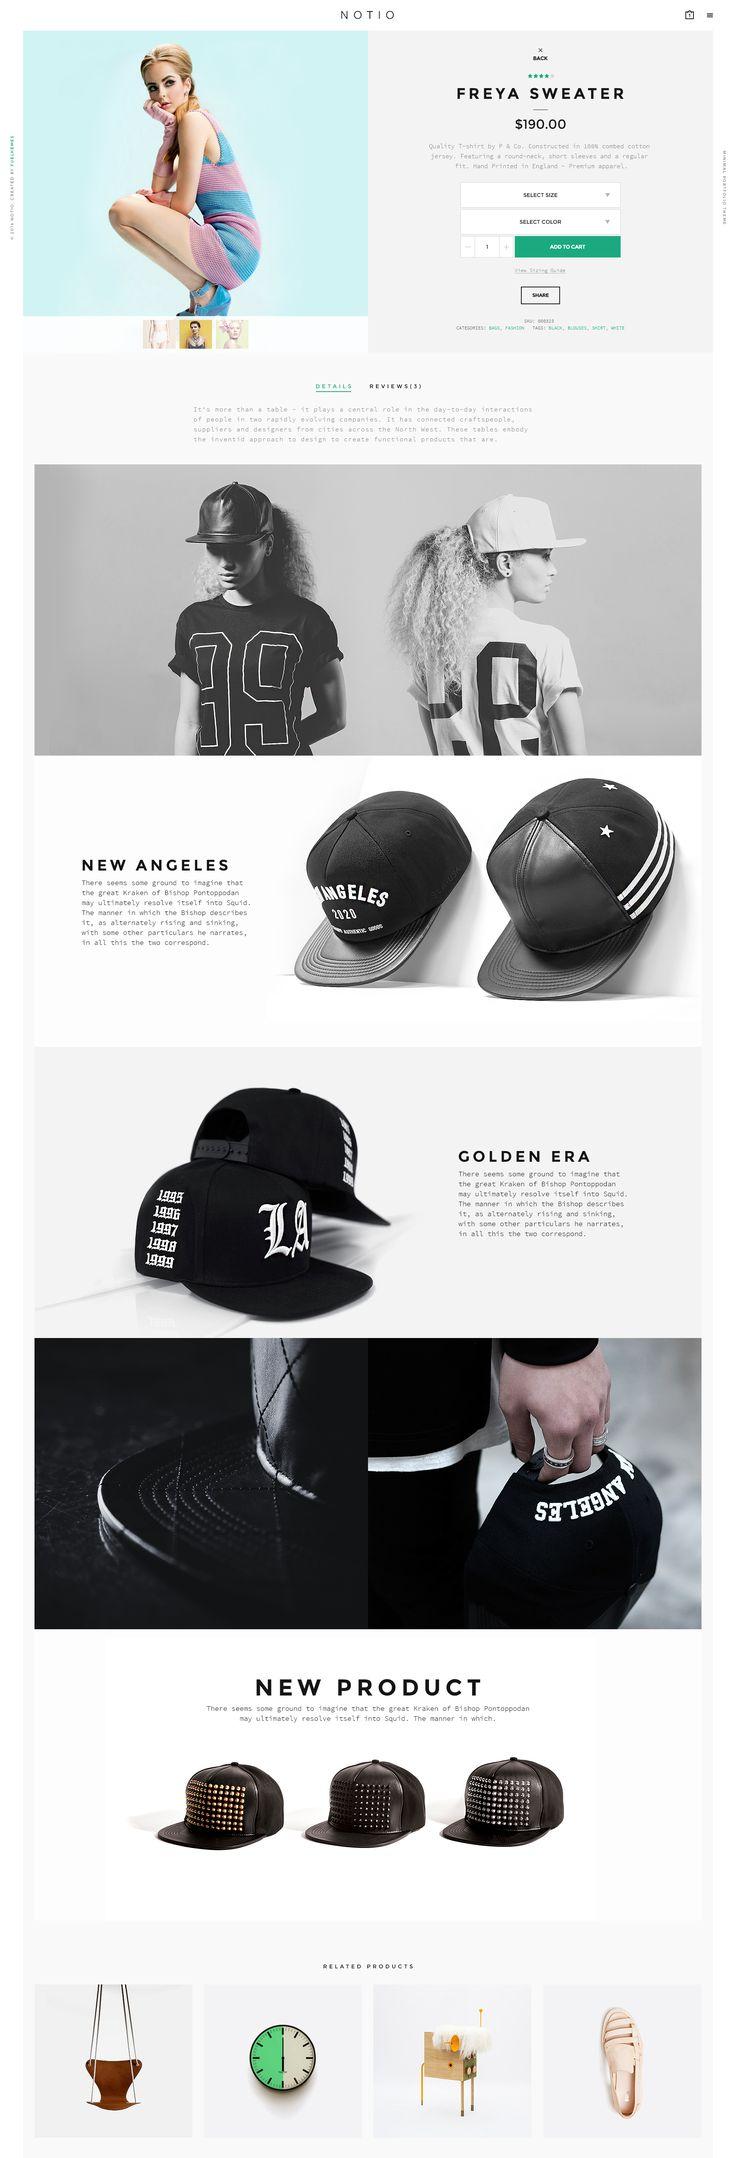 Notio by Aykut Yılmaz #web #webdesign #design #layout #grid #fashion #ecommerce